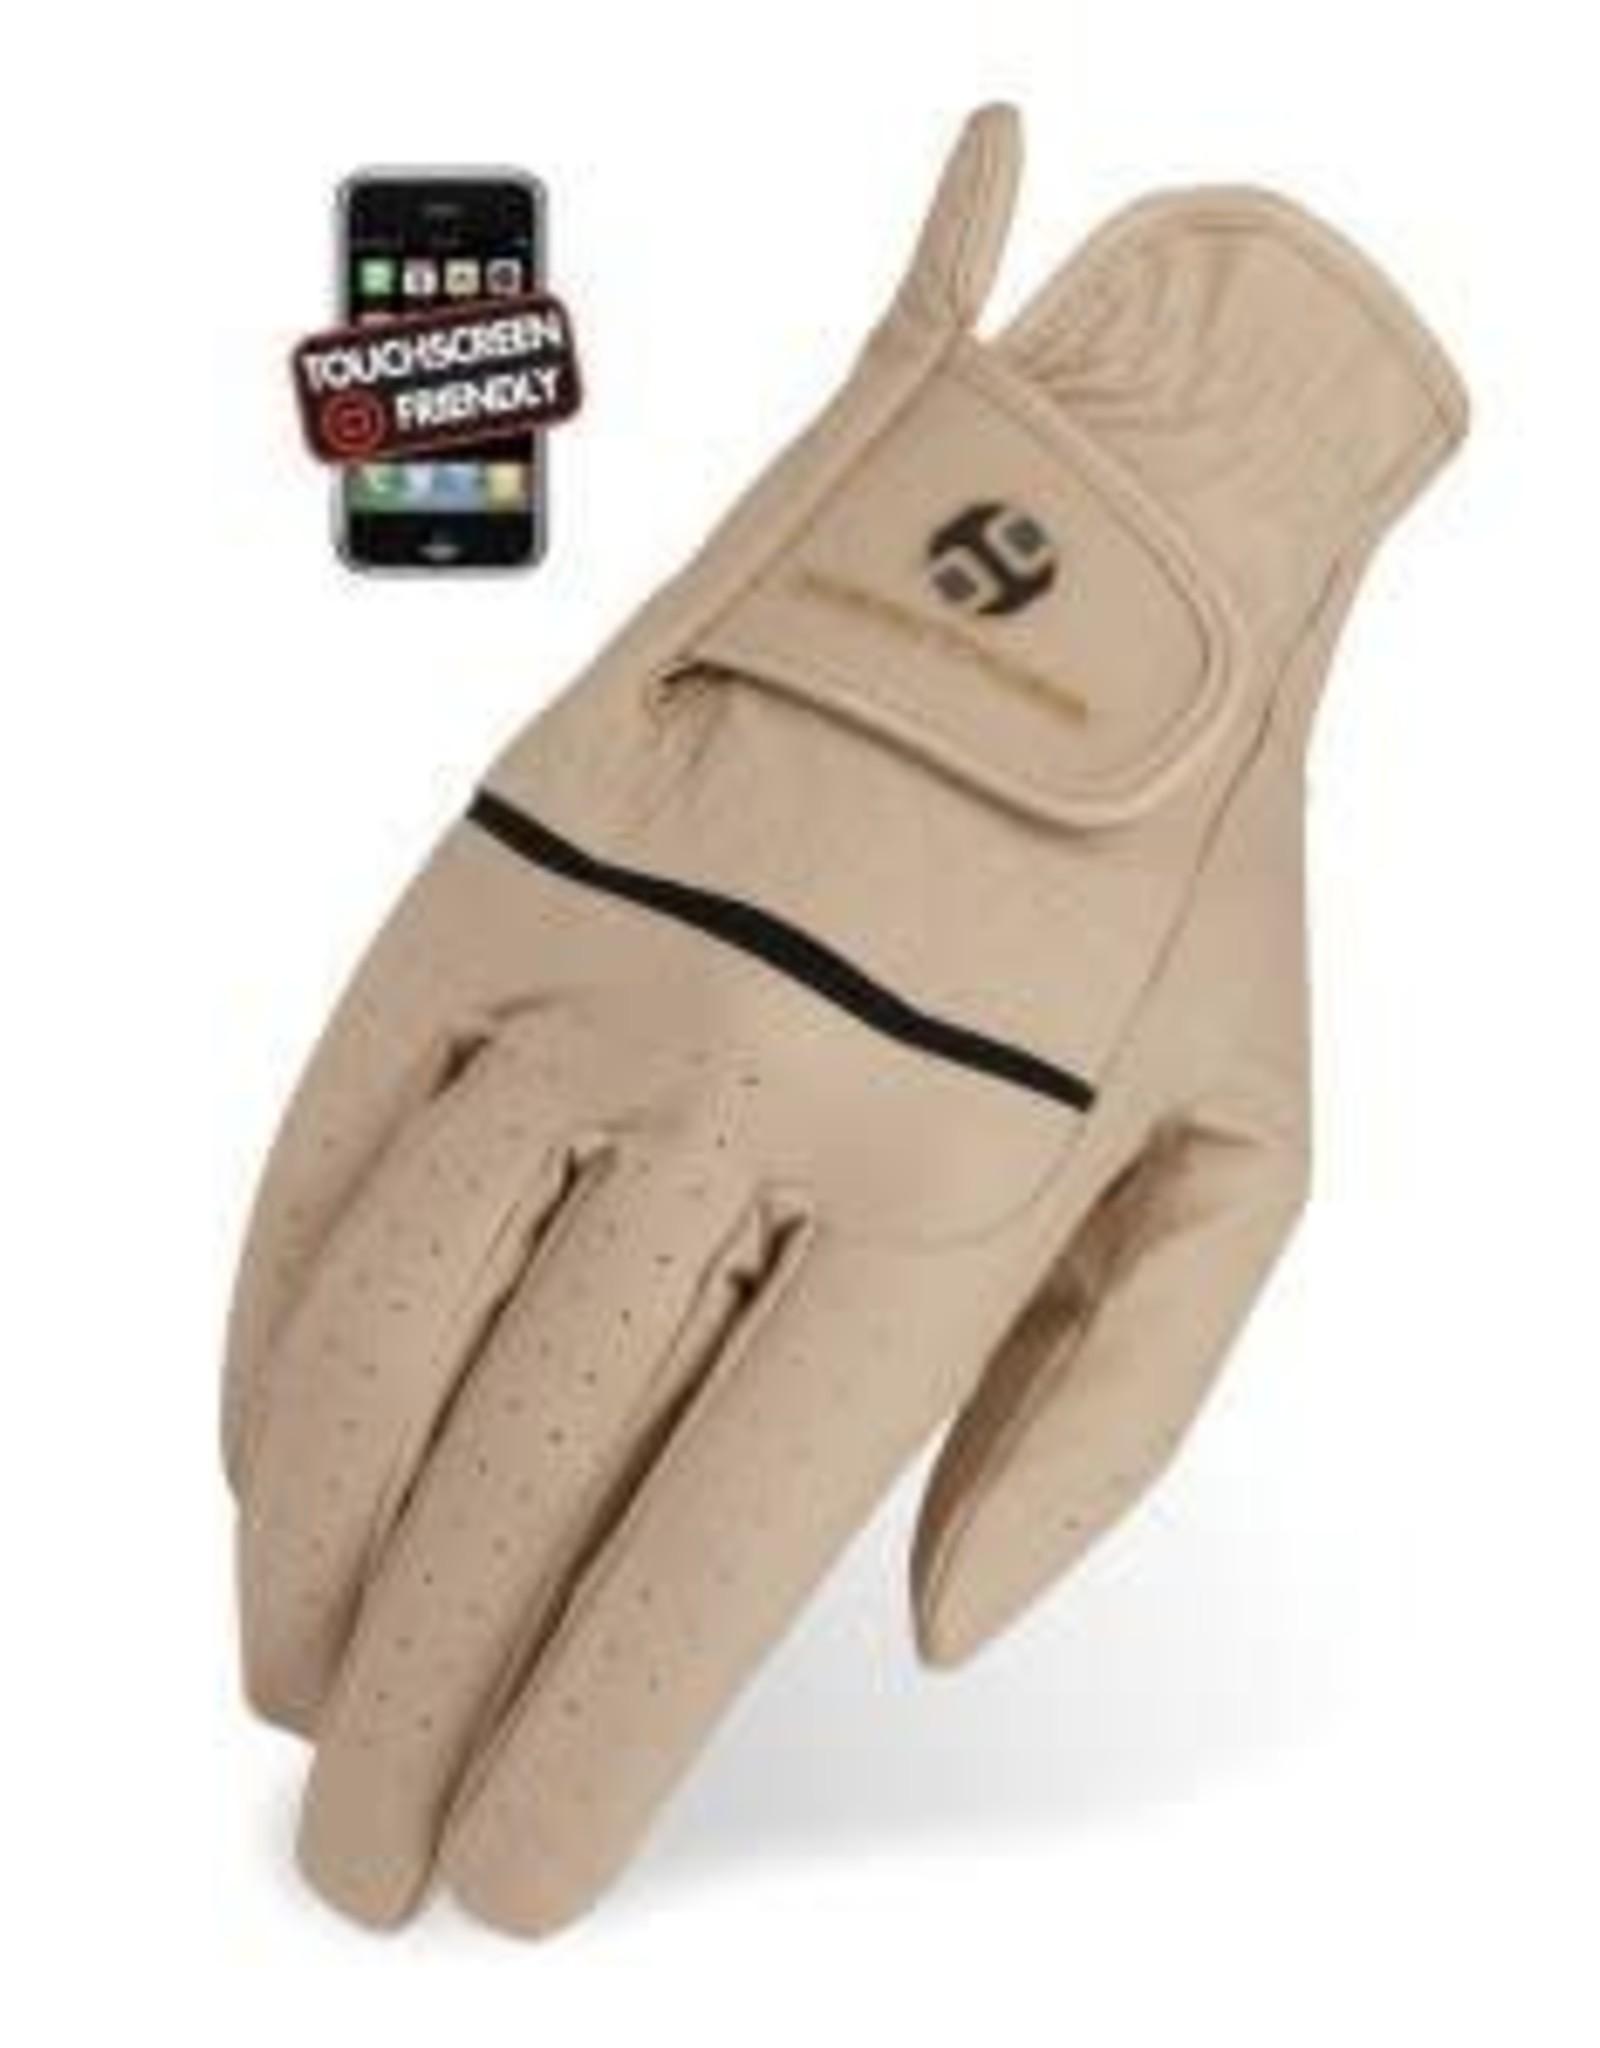 Heritage Premier Show Gloves - Beige - Size 8